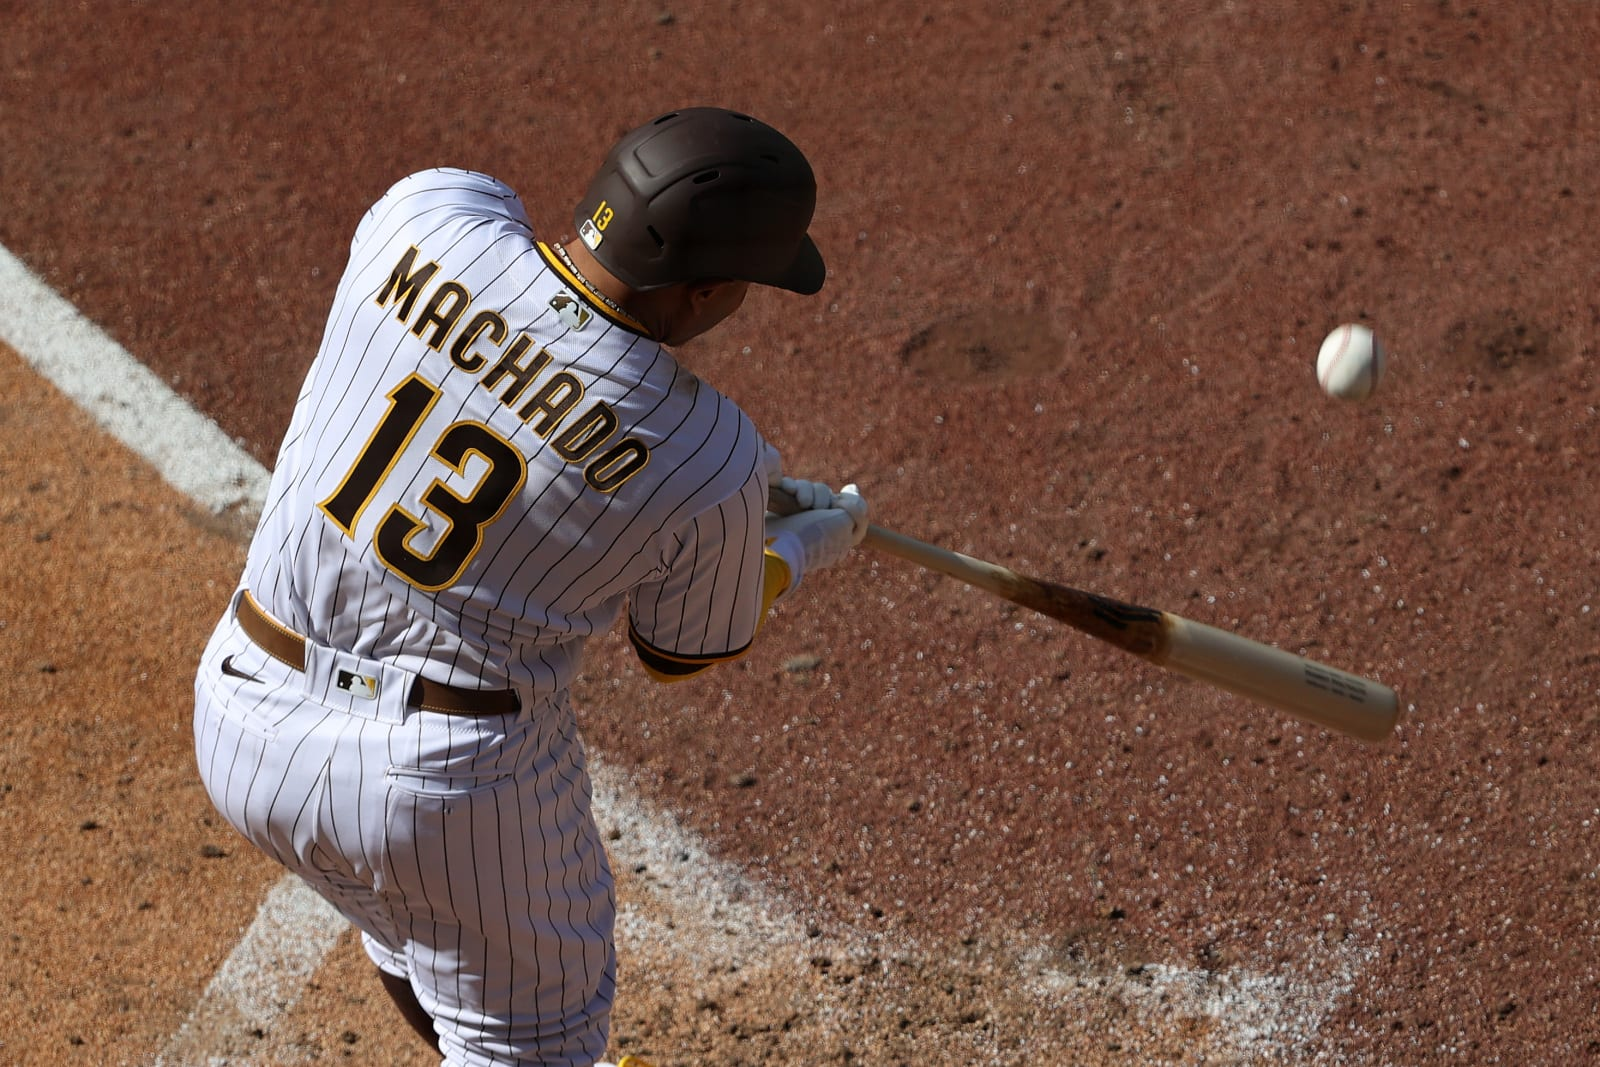 Manny Machado / San Diego Padres